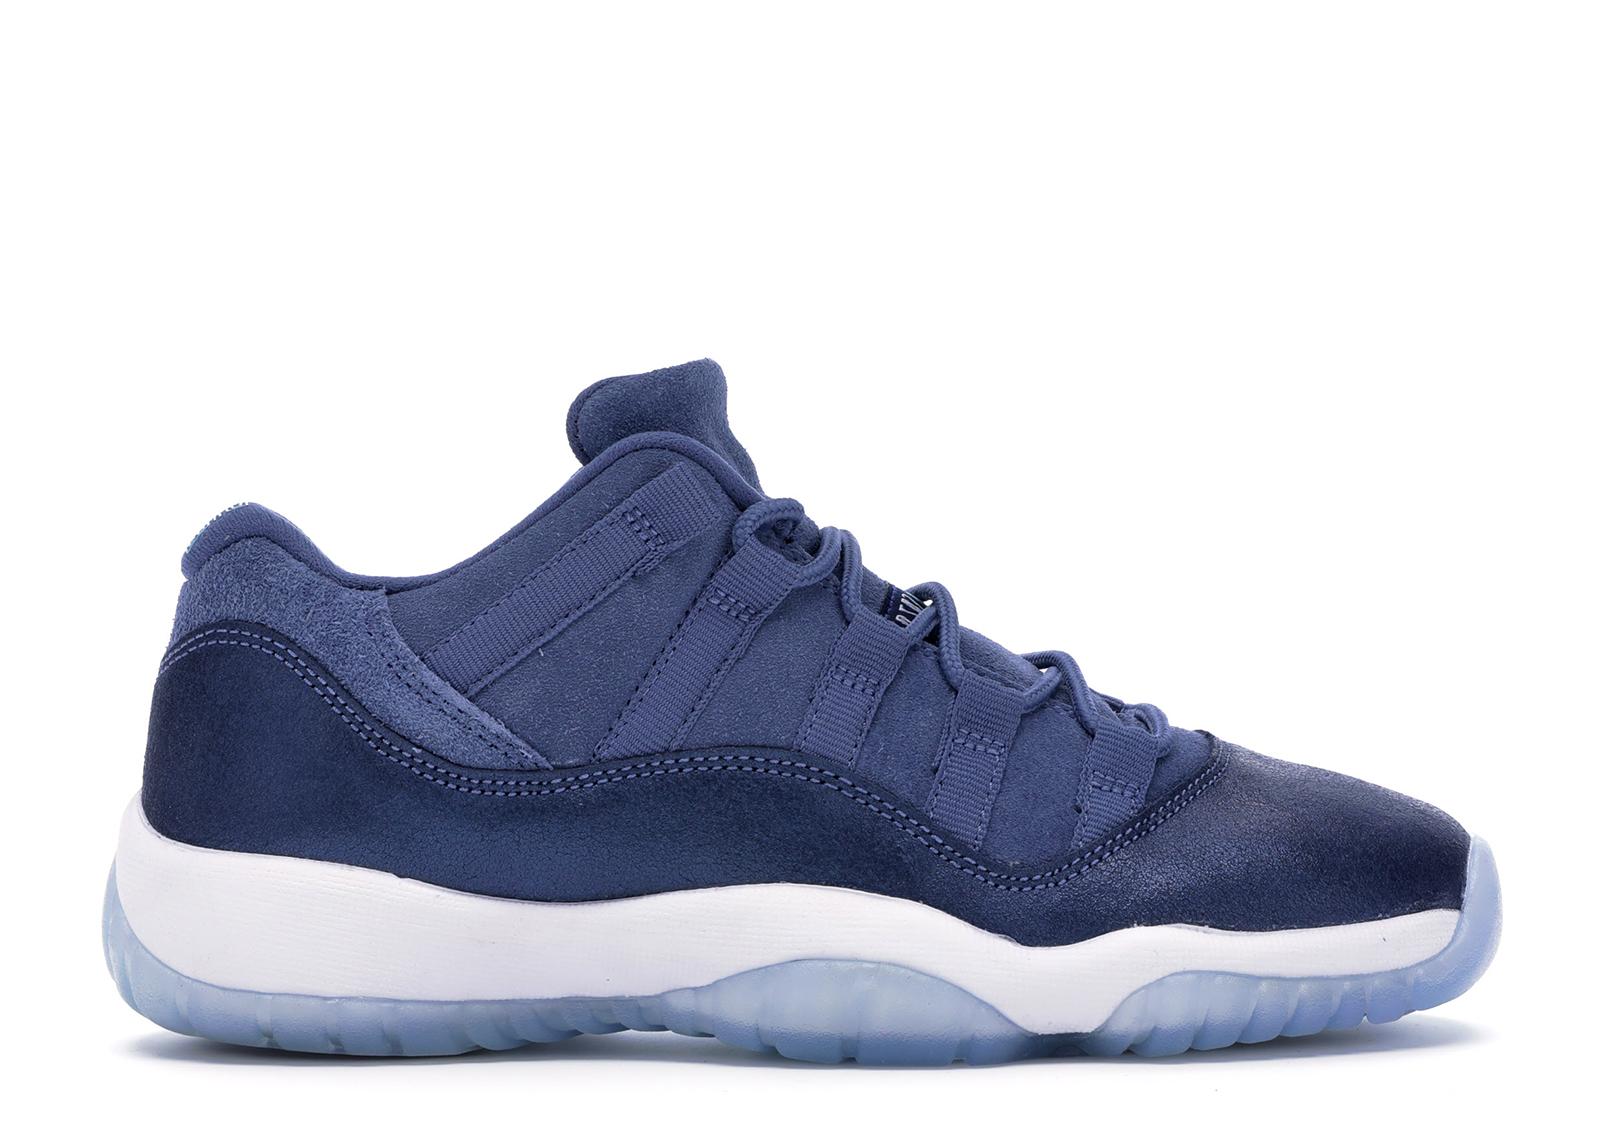 Jordan 11 Retro Low Blue Moon (GS